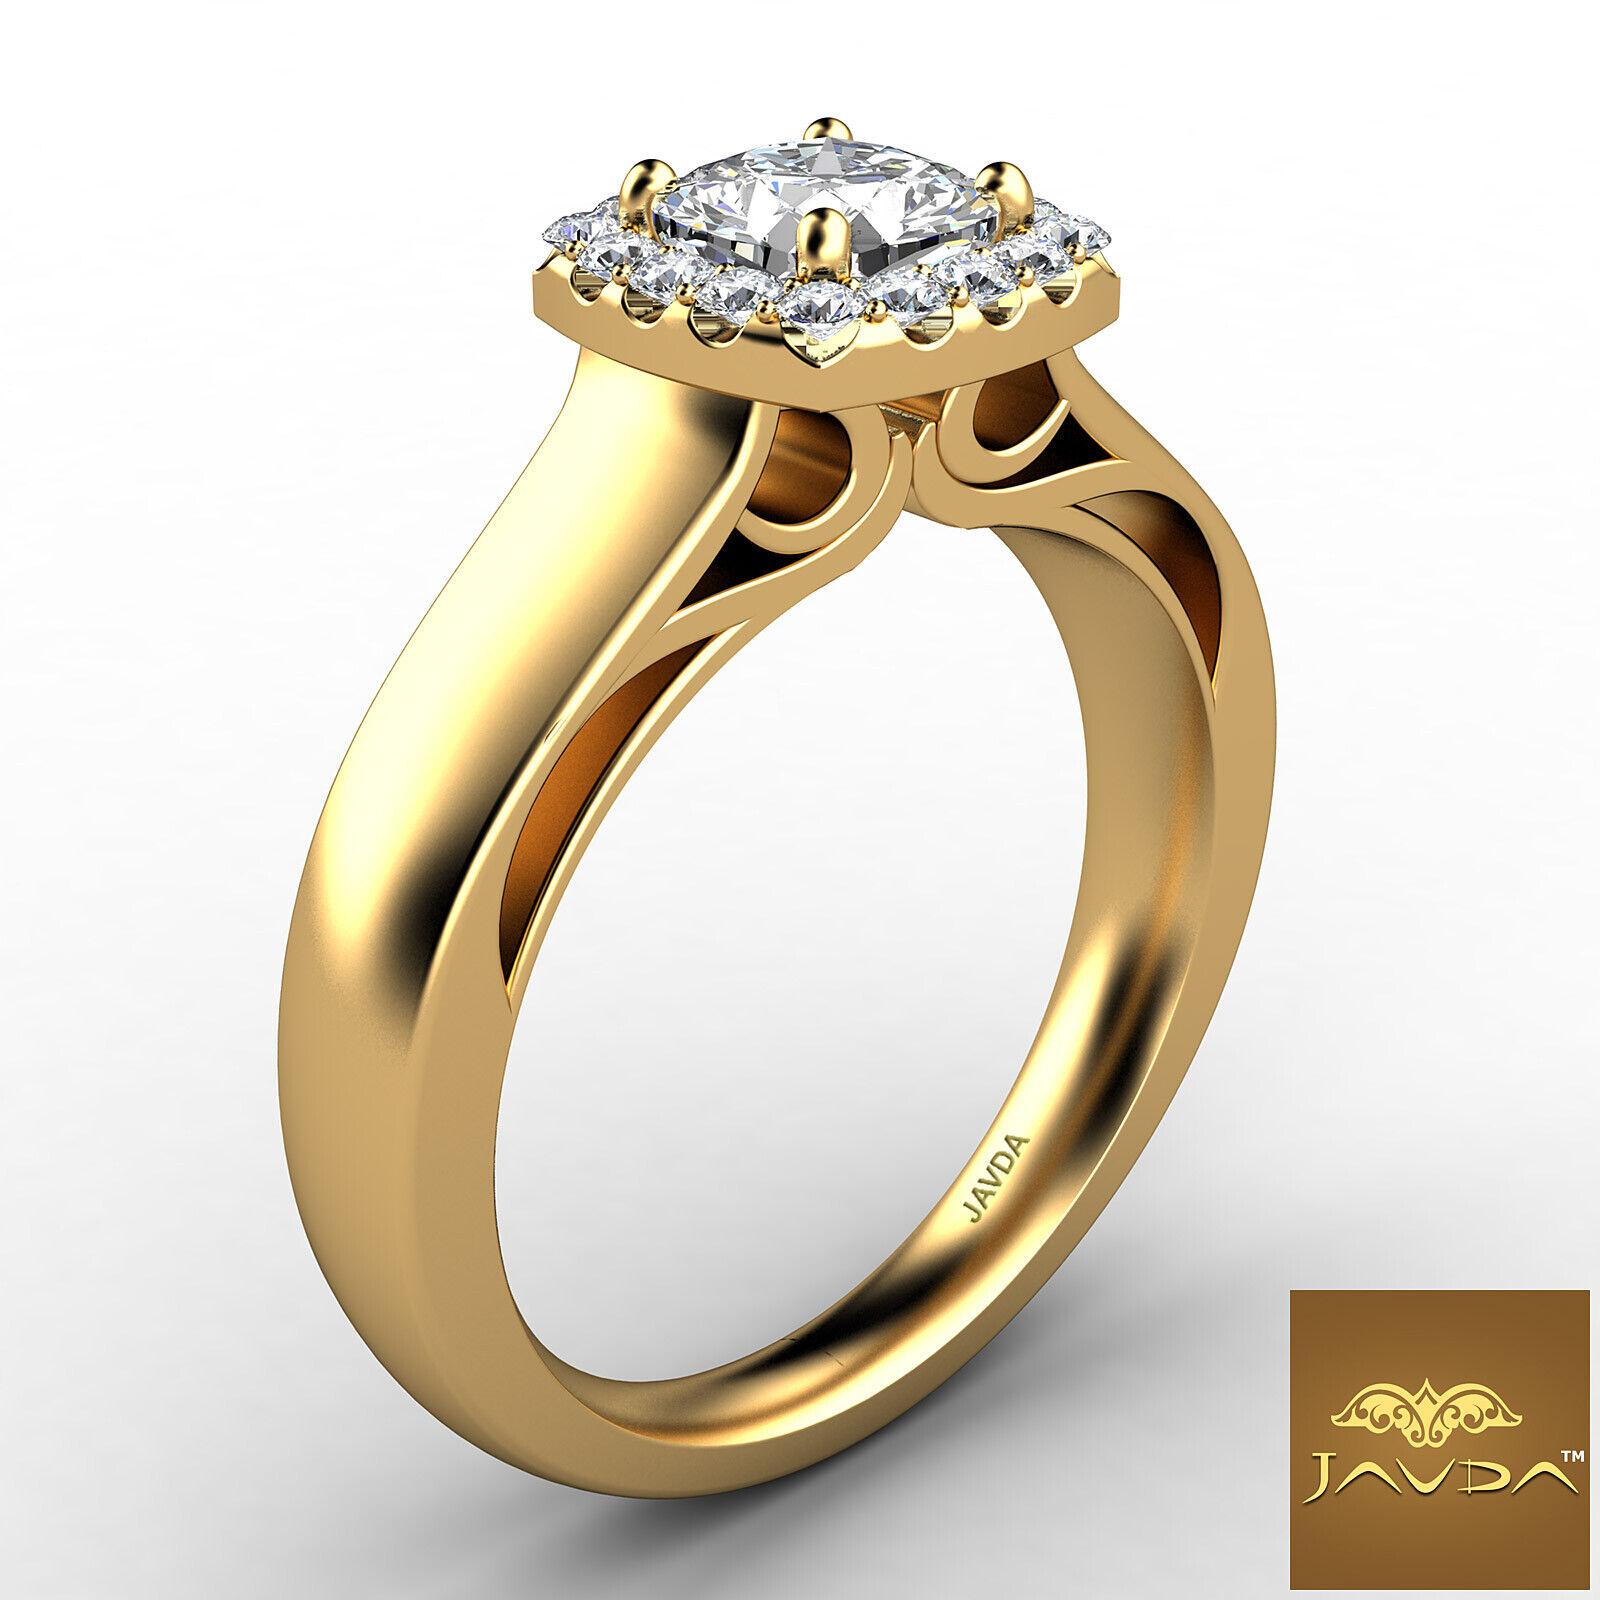 Filigree Shank U Cut Prong Cushion Diamond Engagement GIA H Color VS1 Ring 0.7Ct 6